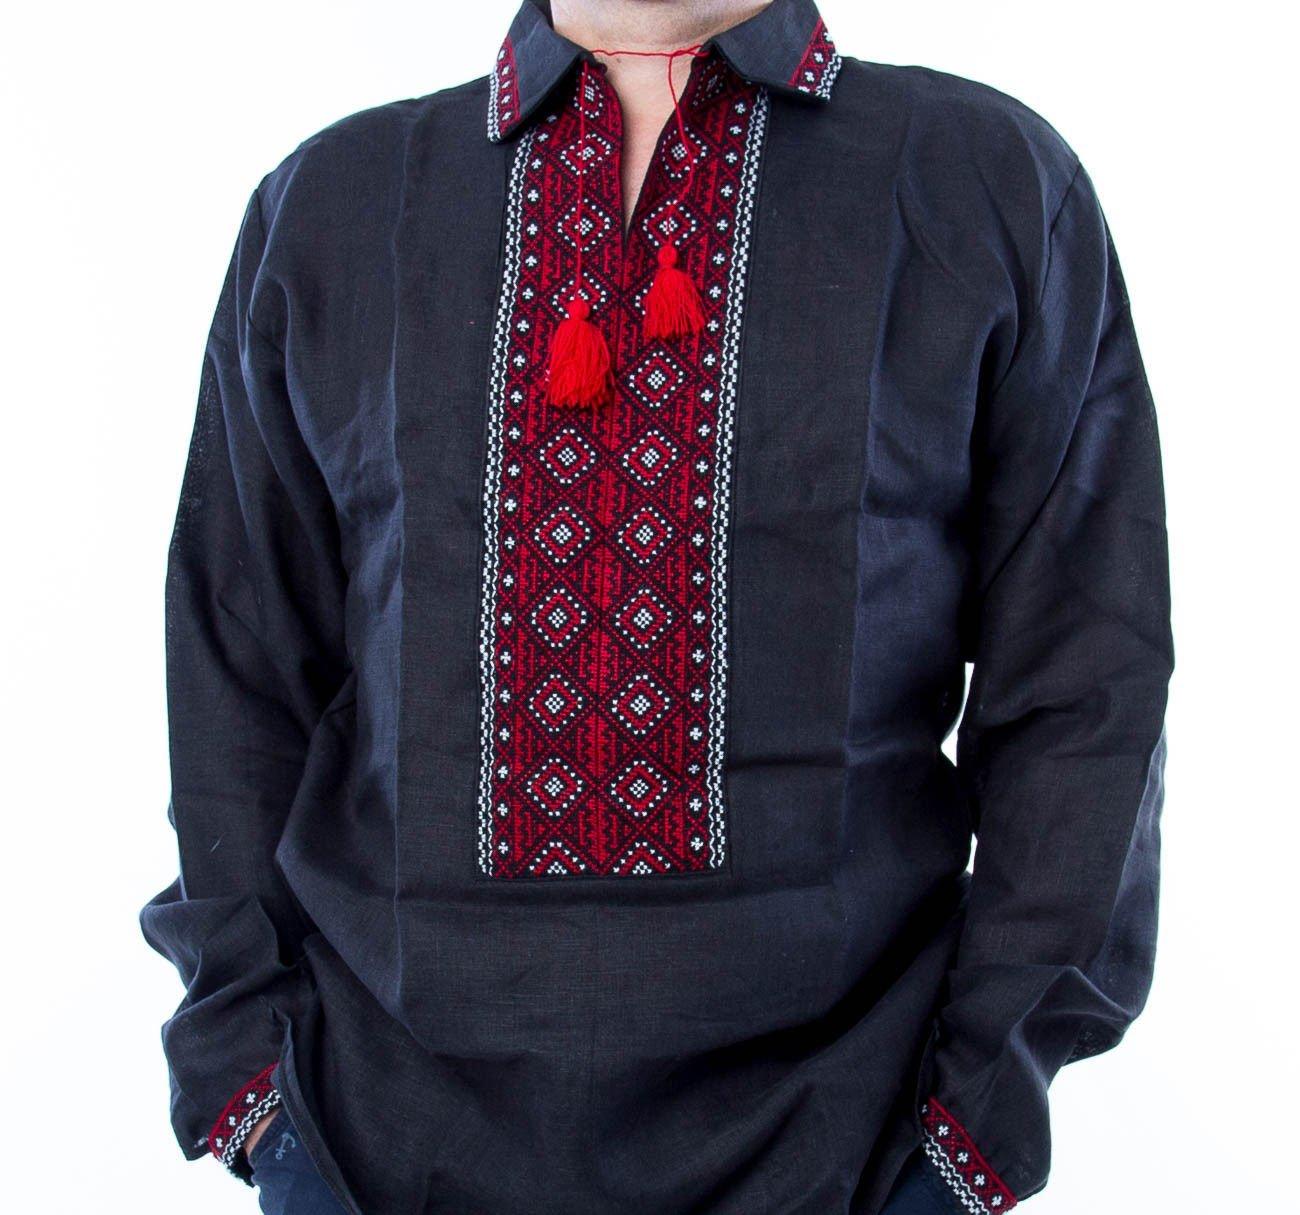 VYSHYVANKA 男性 ブラック レッド ウクライナ 刺繍入りリネンシャツ 3XL 彼へのギフト B07DPLRTPW